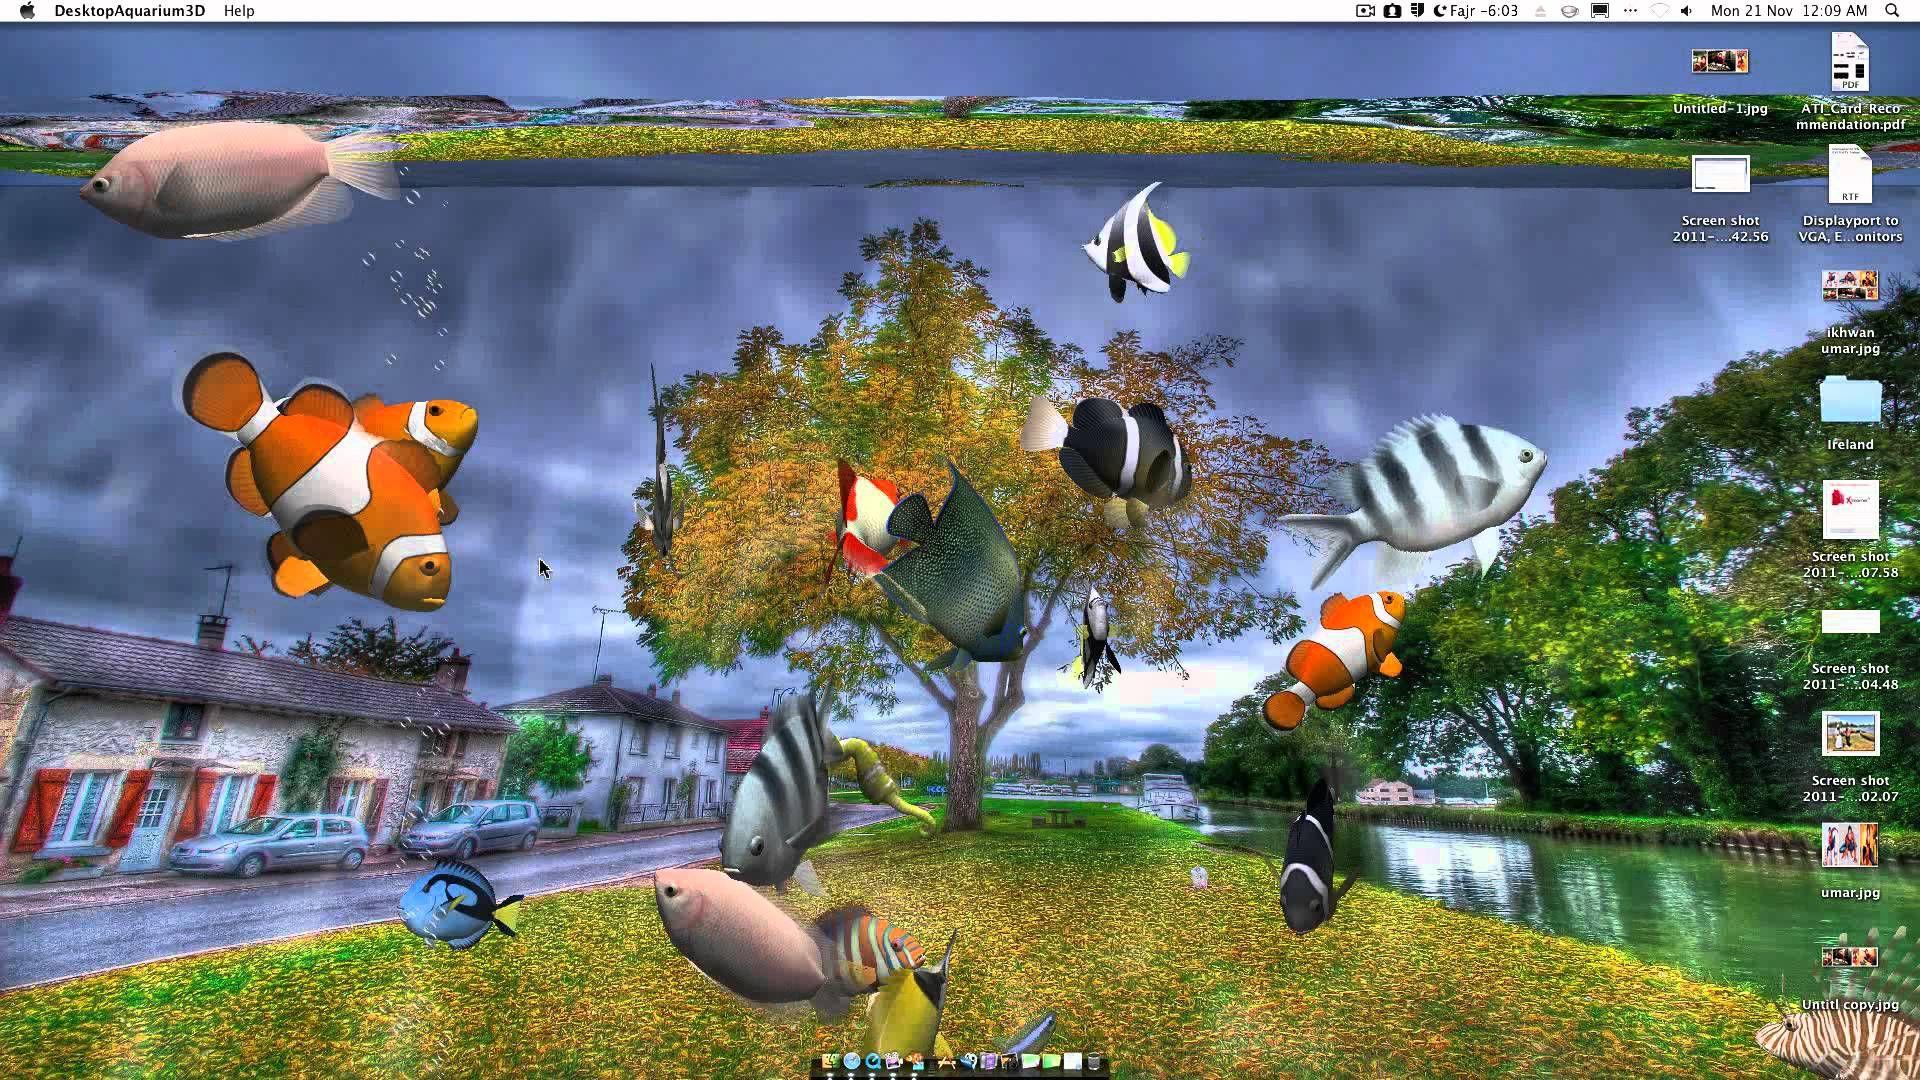 Liquid Live Desktop Wallpaper Screensaver Free download and 1600×1000 Download Wallpapers Live ...